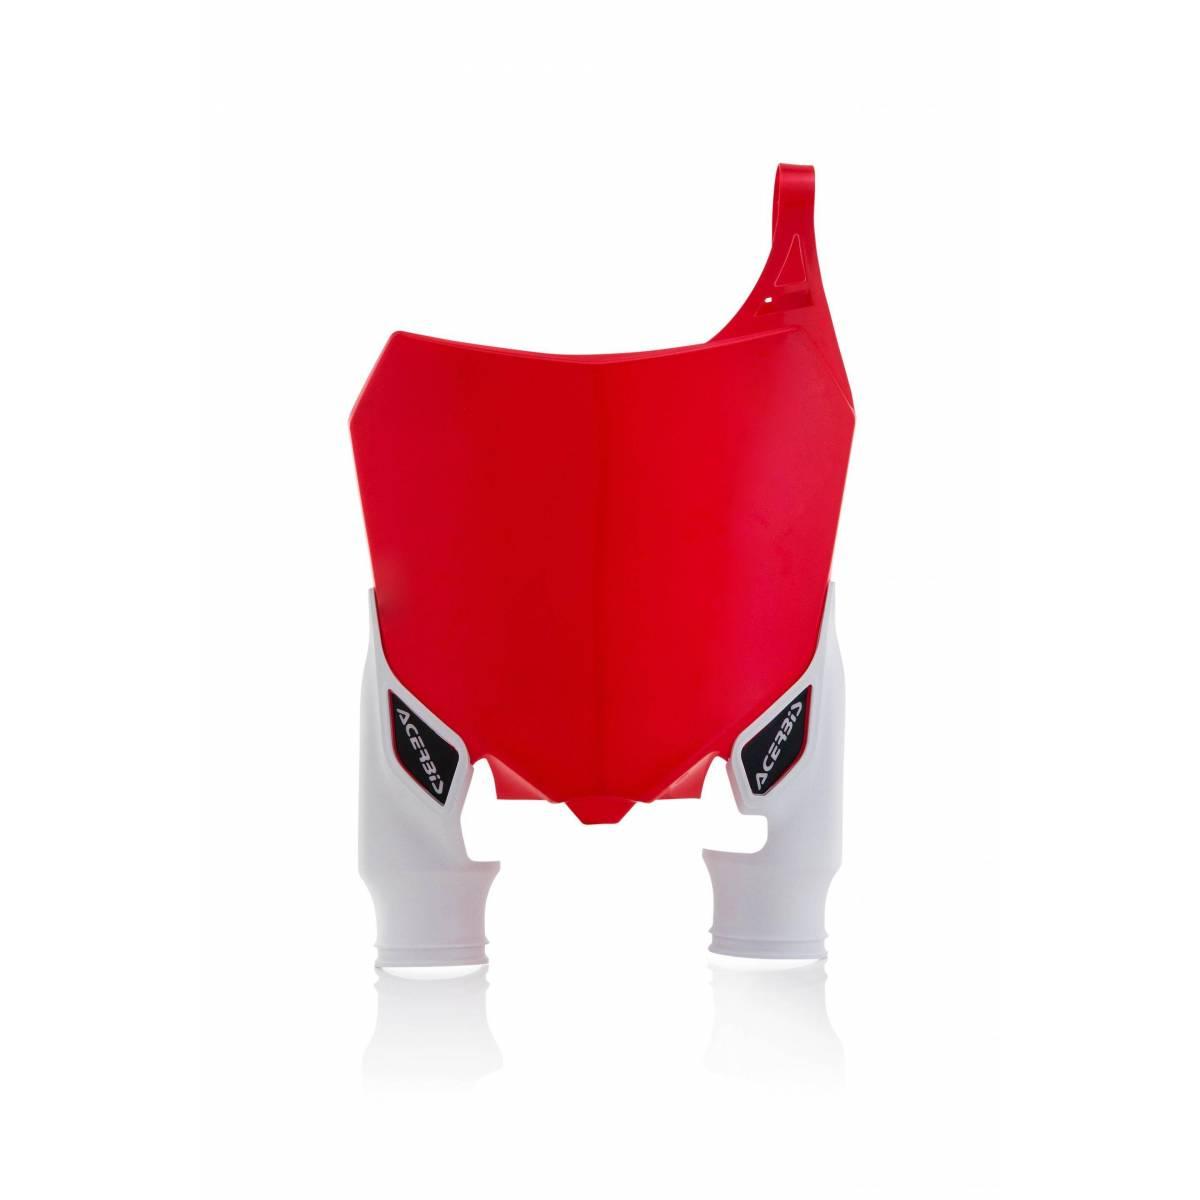 0022142-343 - Portanumero Delantero Raptor Crf250 14 17 450 13 16 Rojo Blanco